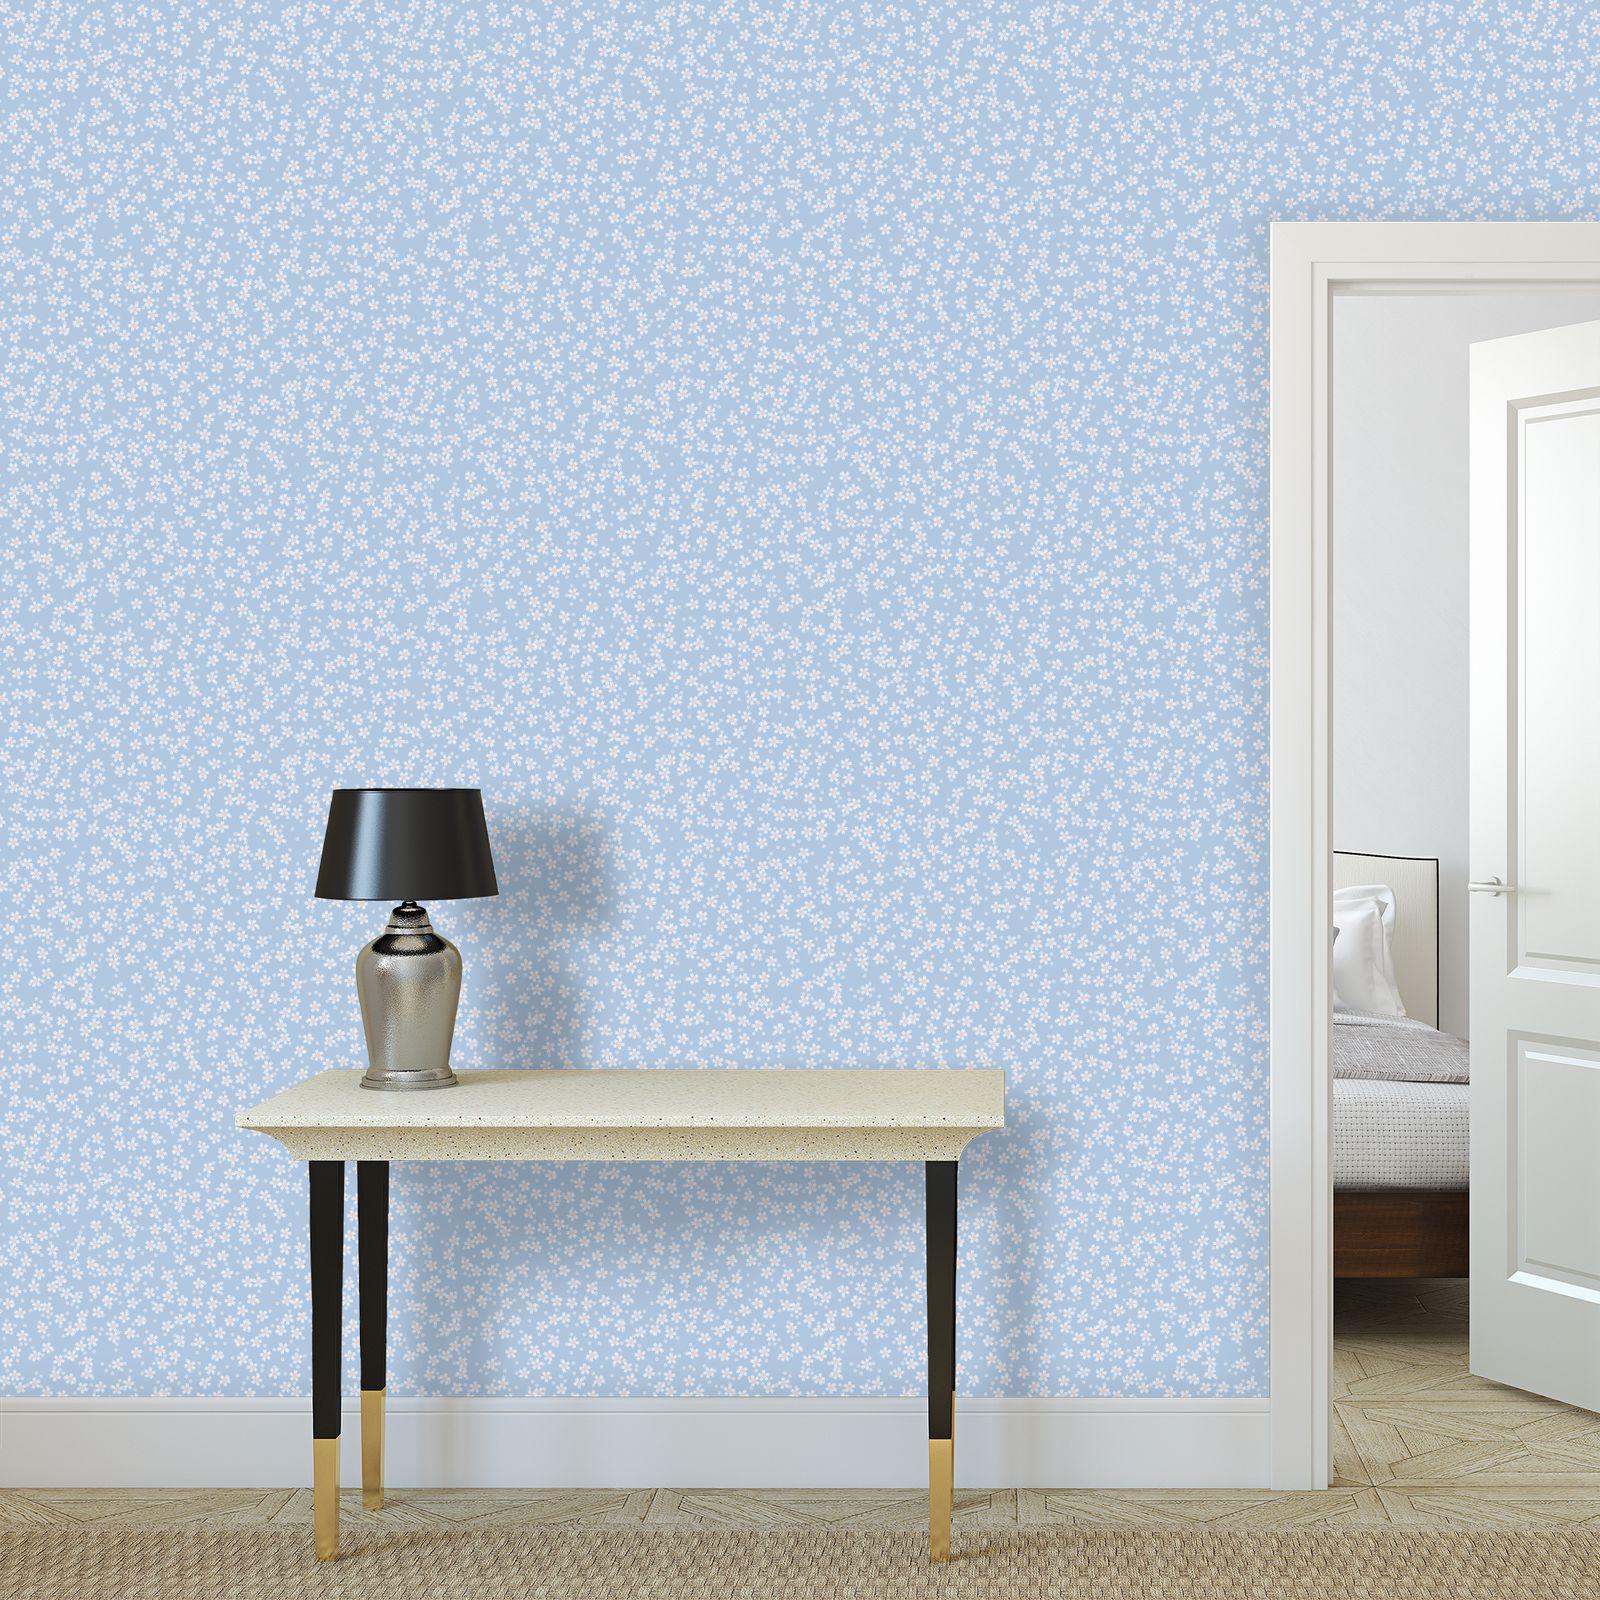 Forget-me-not - Wallpaper Rolls – floral gift, flowered vintage granny chic, light blue flowers, soft